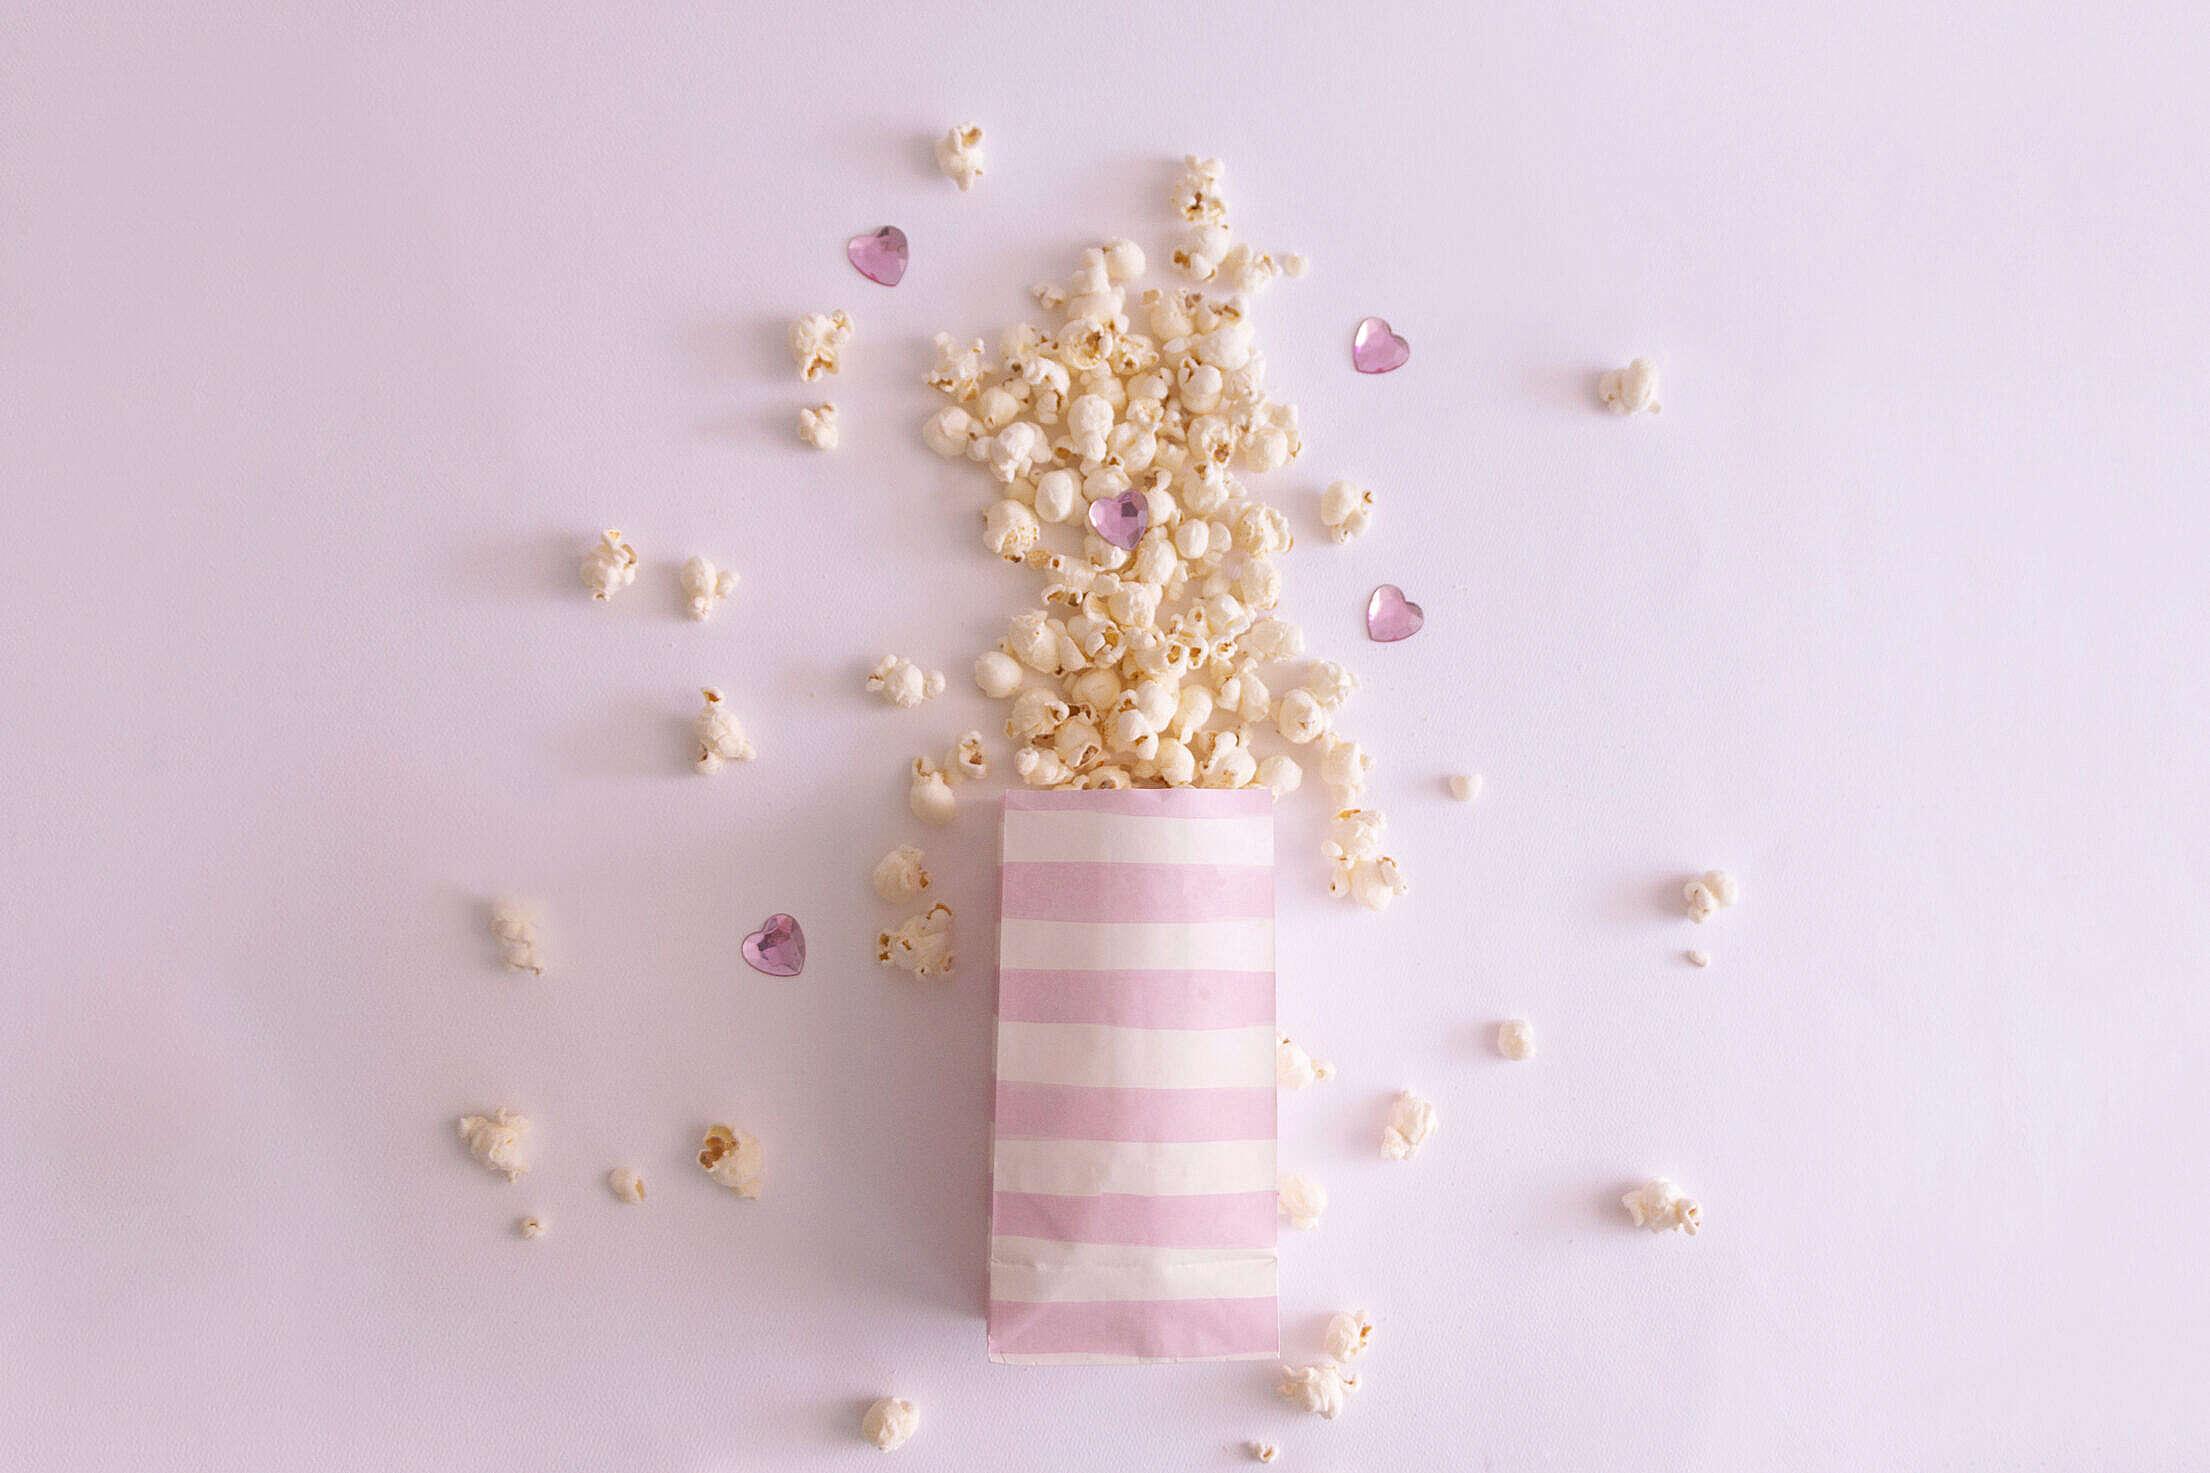 Magical Popcorn Free Stock Photo